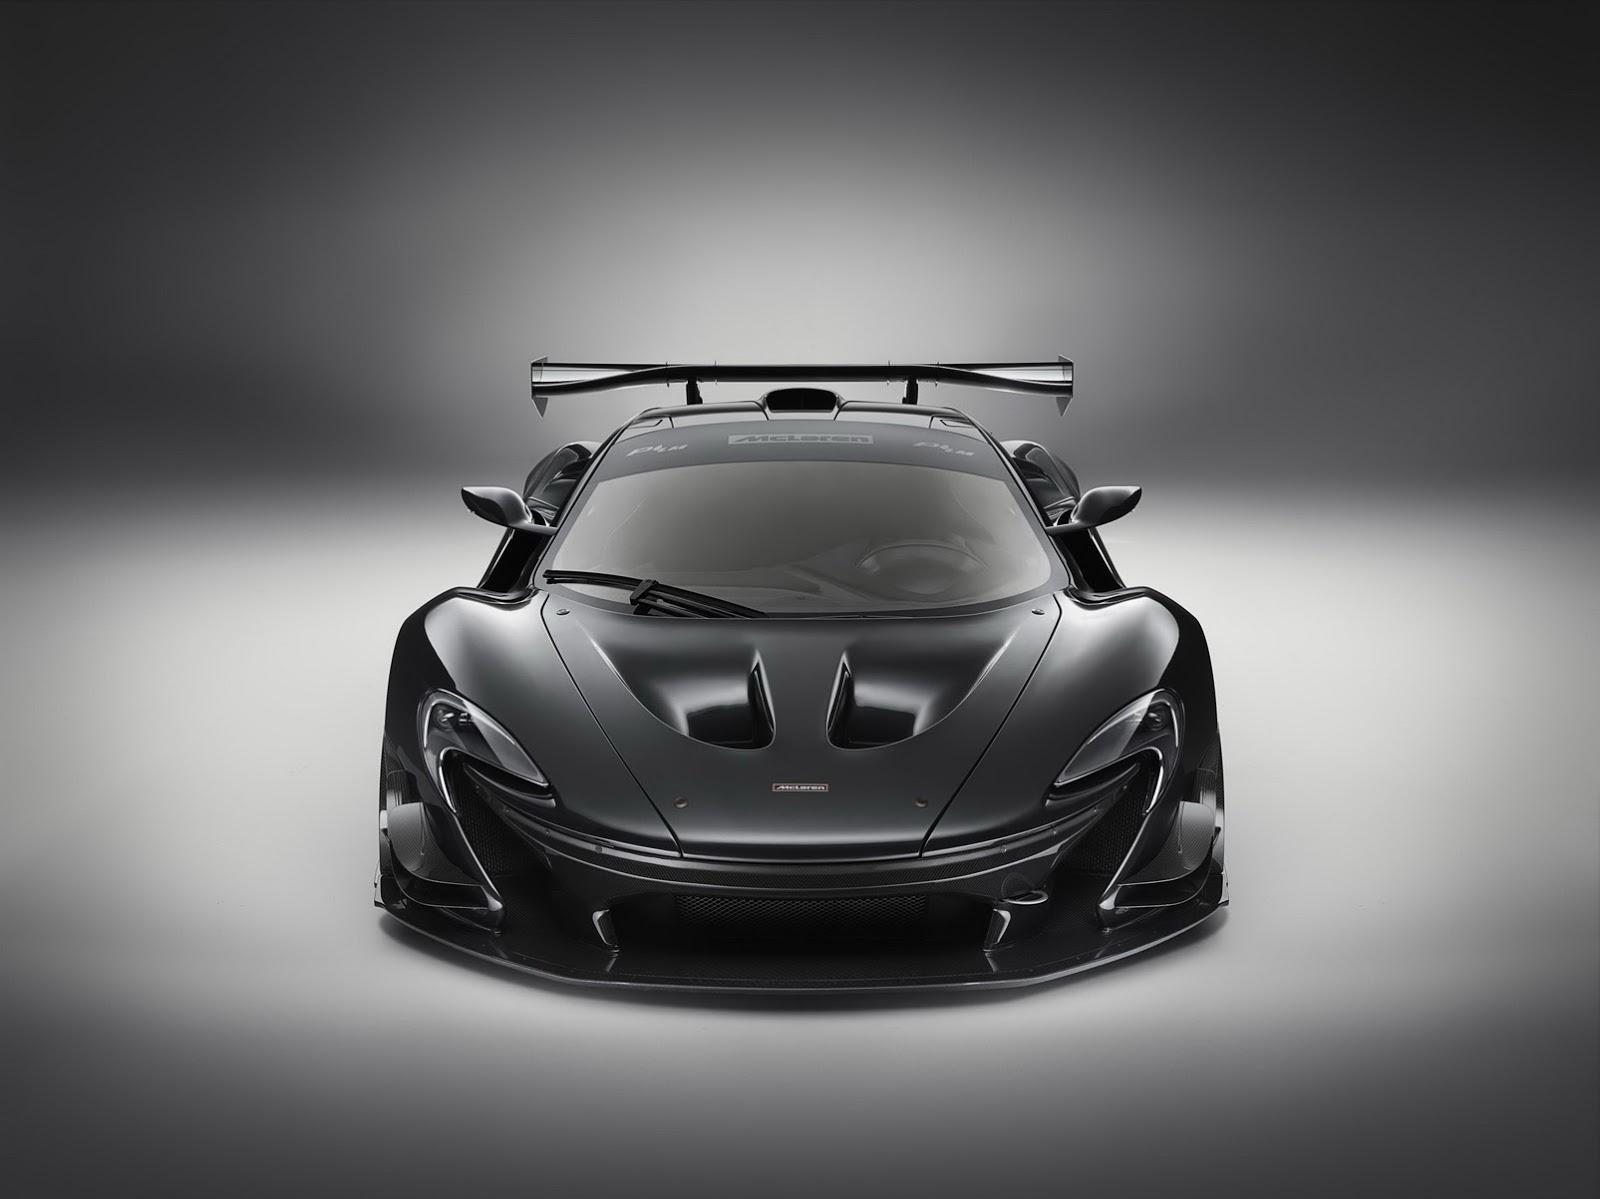 McLaren_P1_LM_Prototype_01